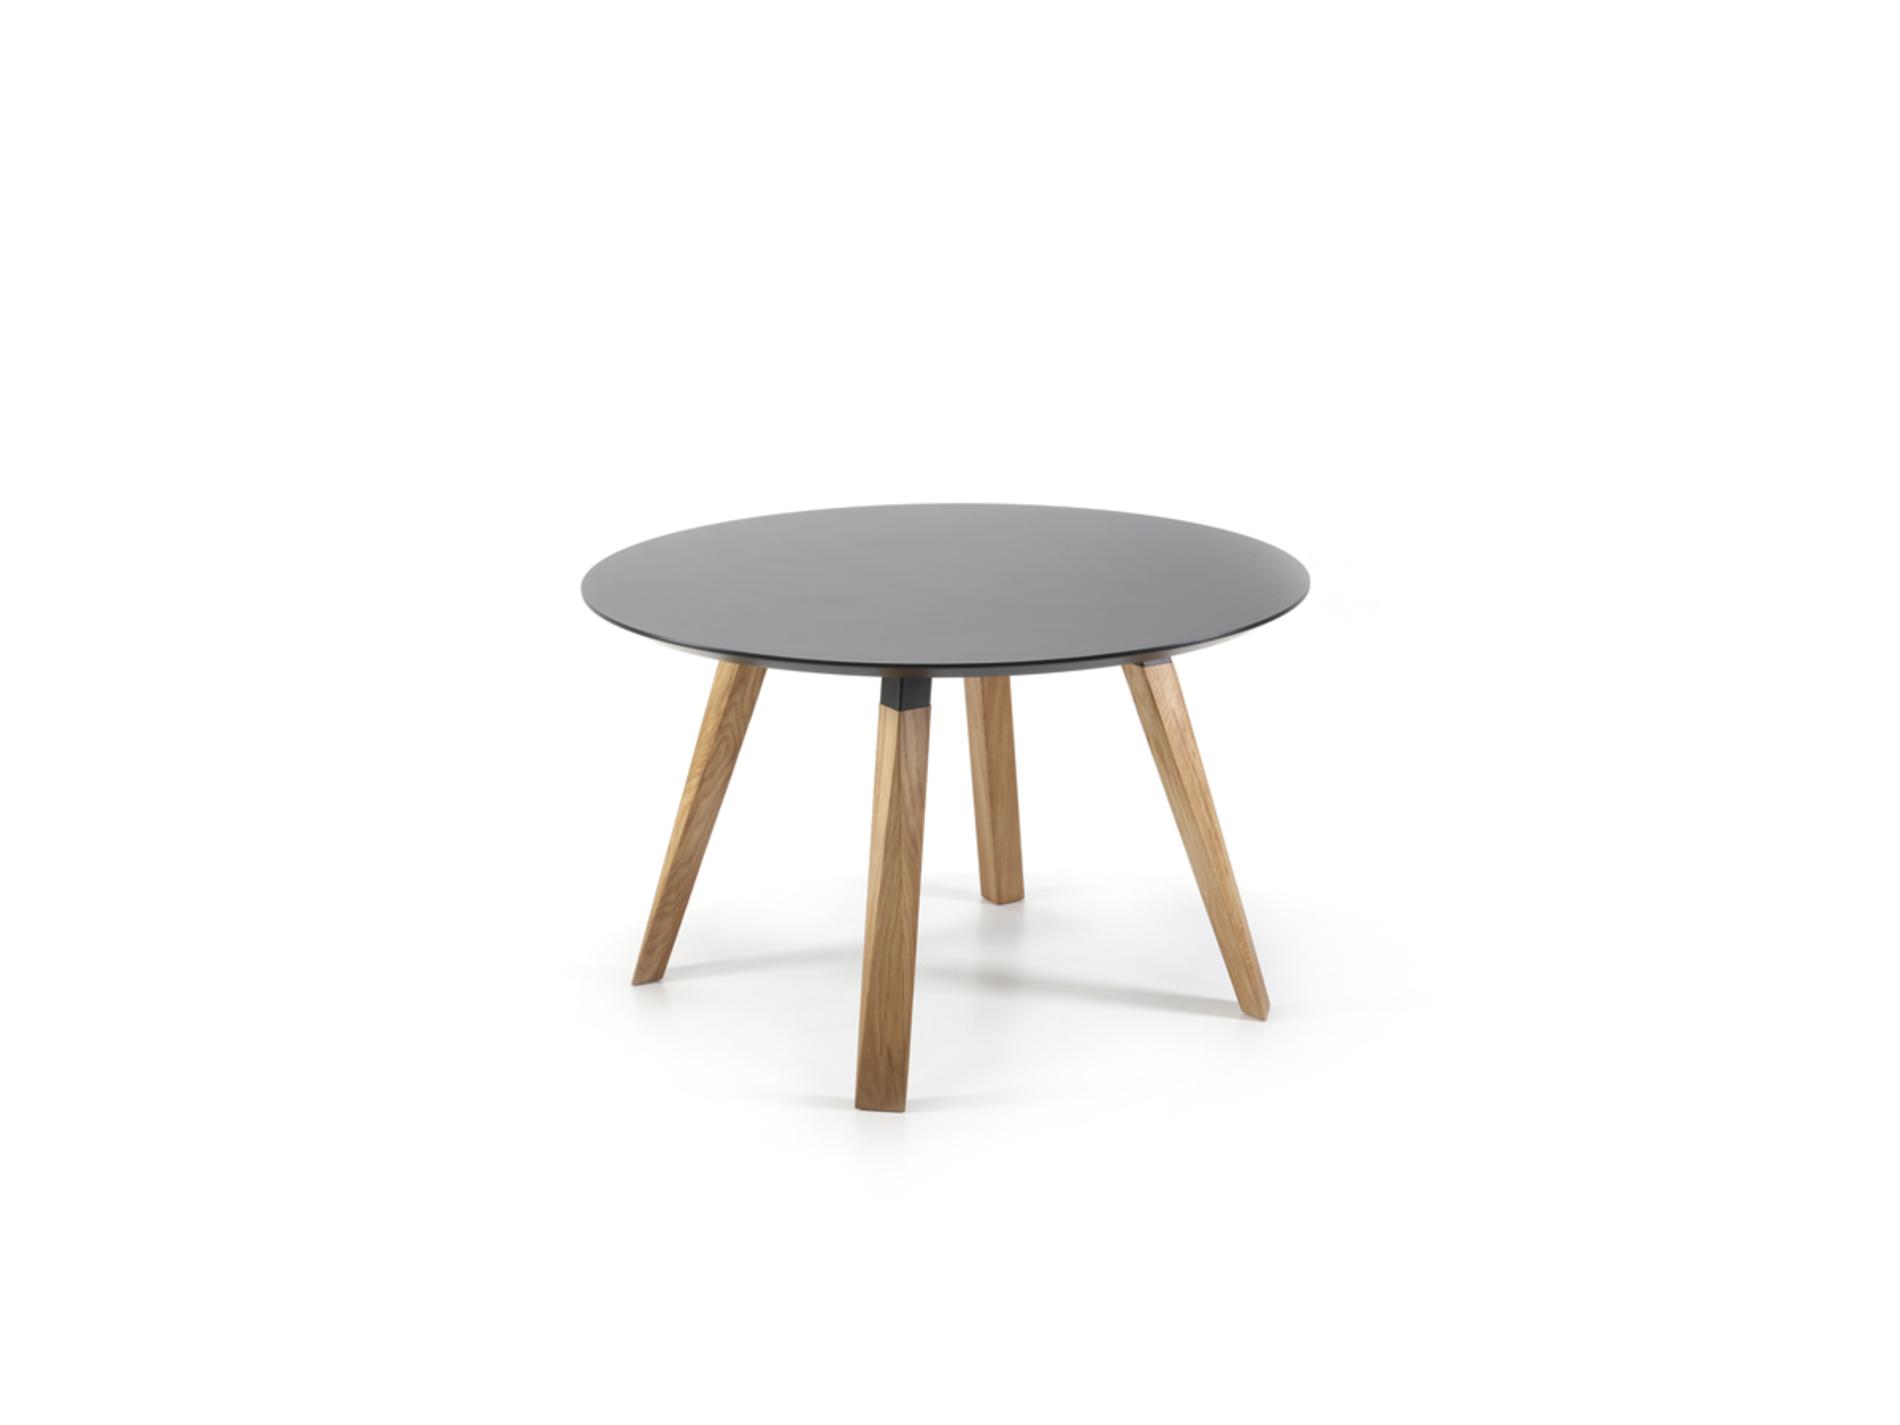 Tisch oblique prostoria 04